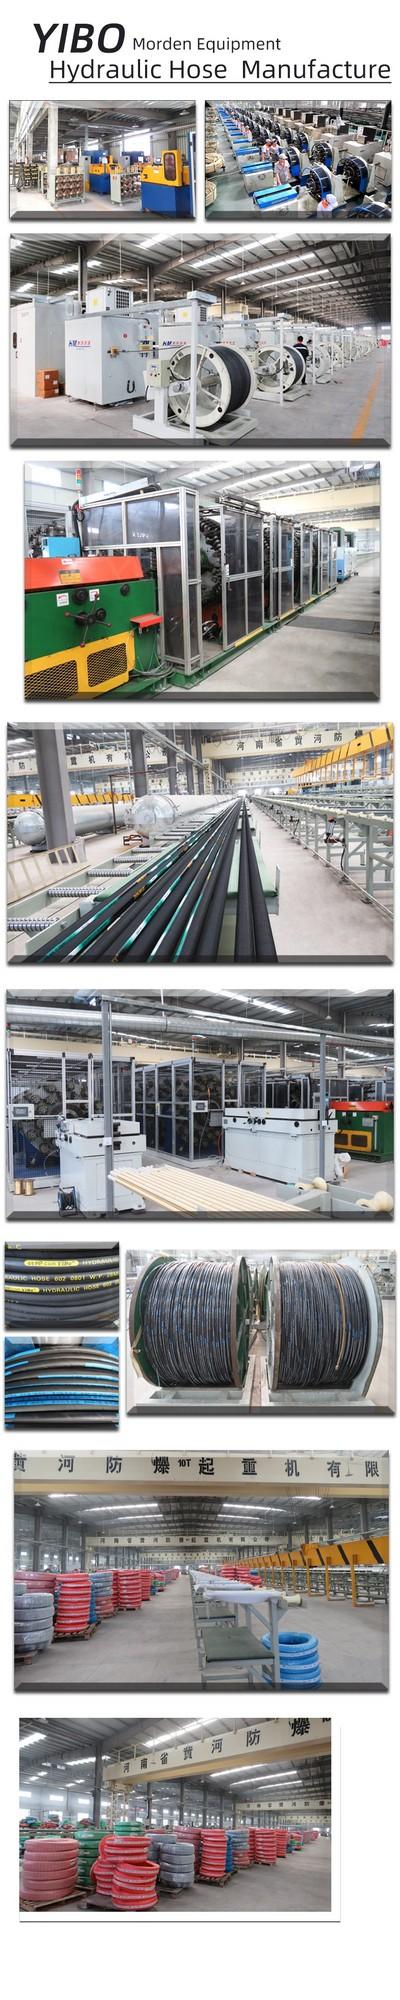 sae 100r15 reinforced hydraulic rubber hose 4